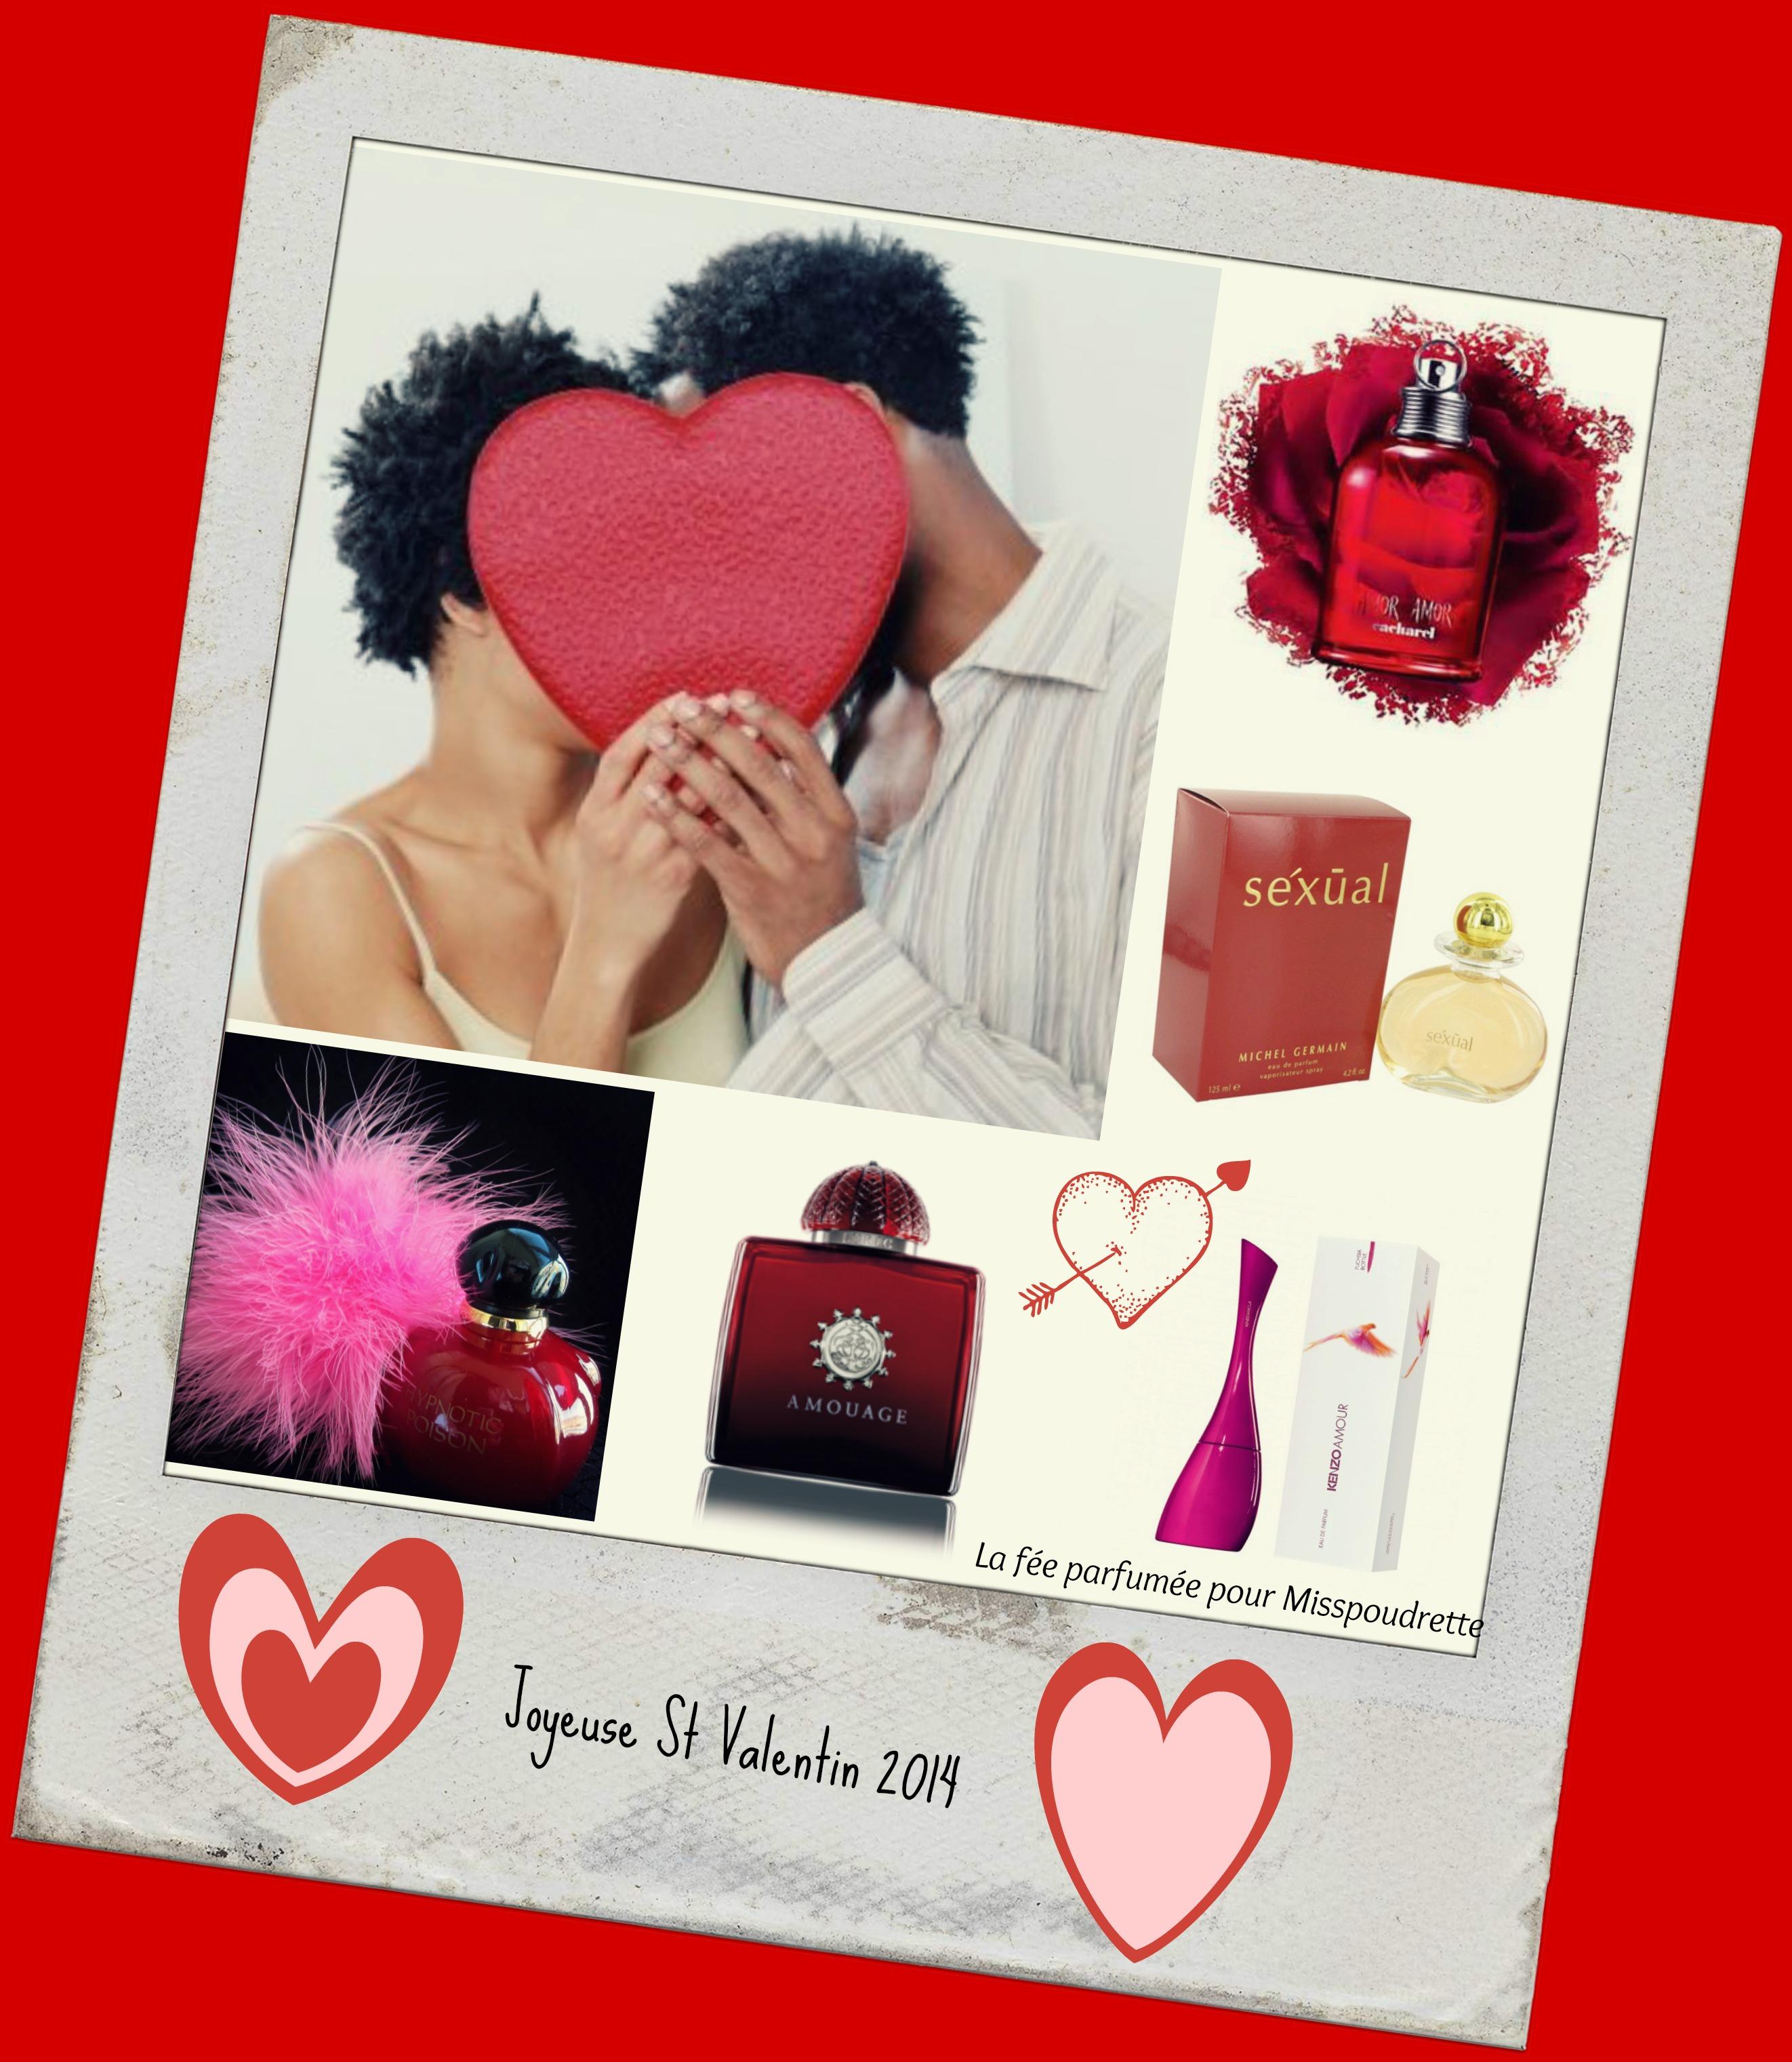 St Valentin 2014 -Clarisse Monereau